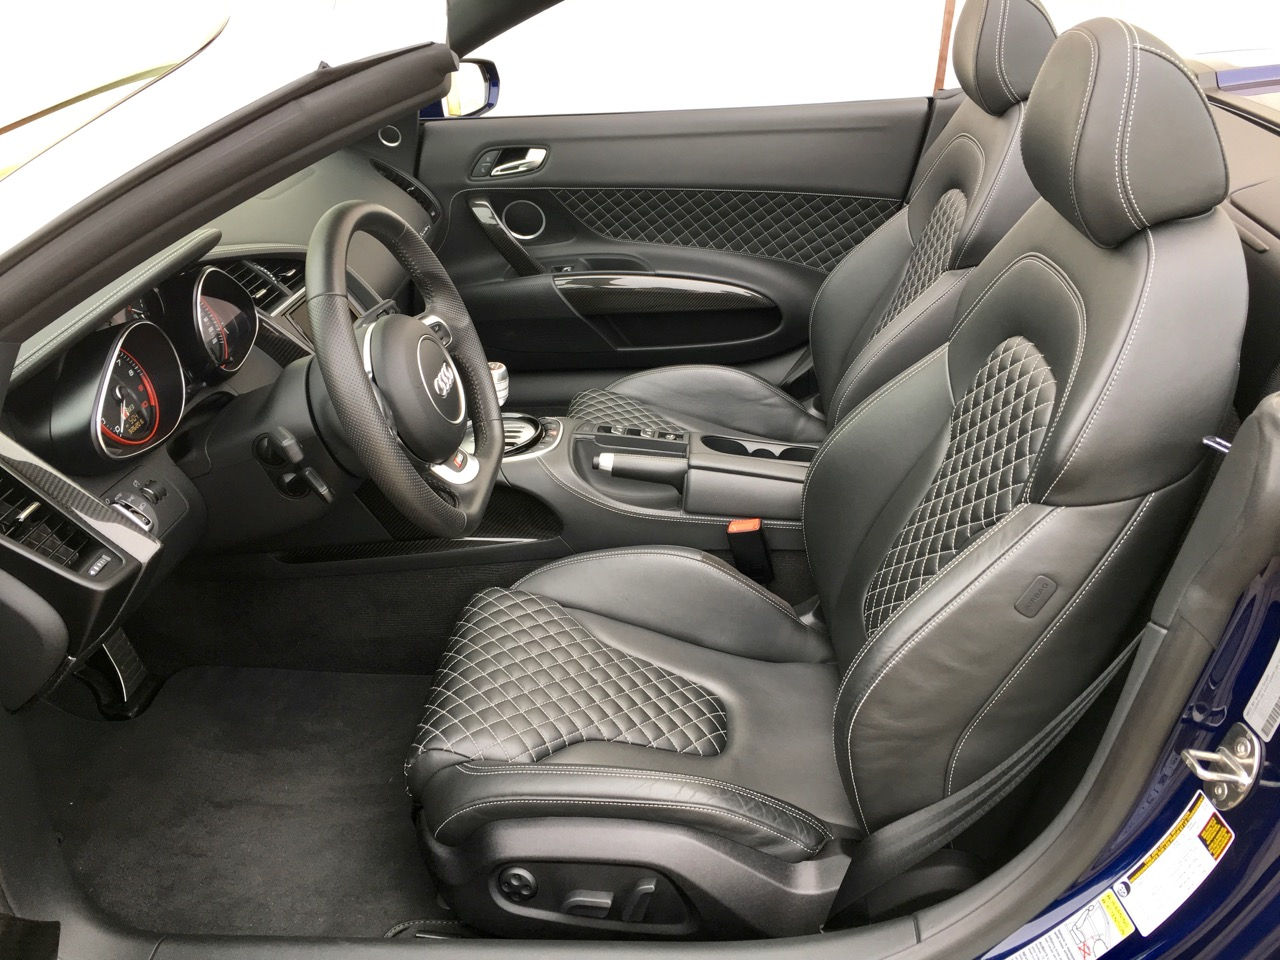 2014 Audi R8 Spyder (EN000164) - 18.jpg